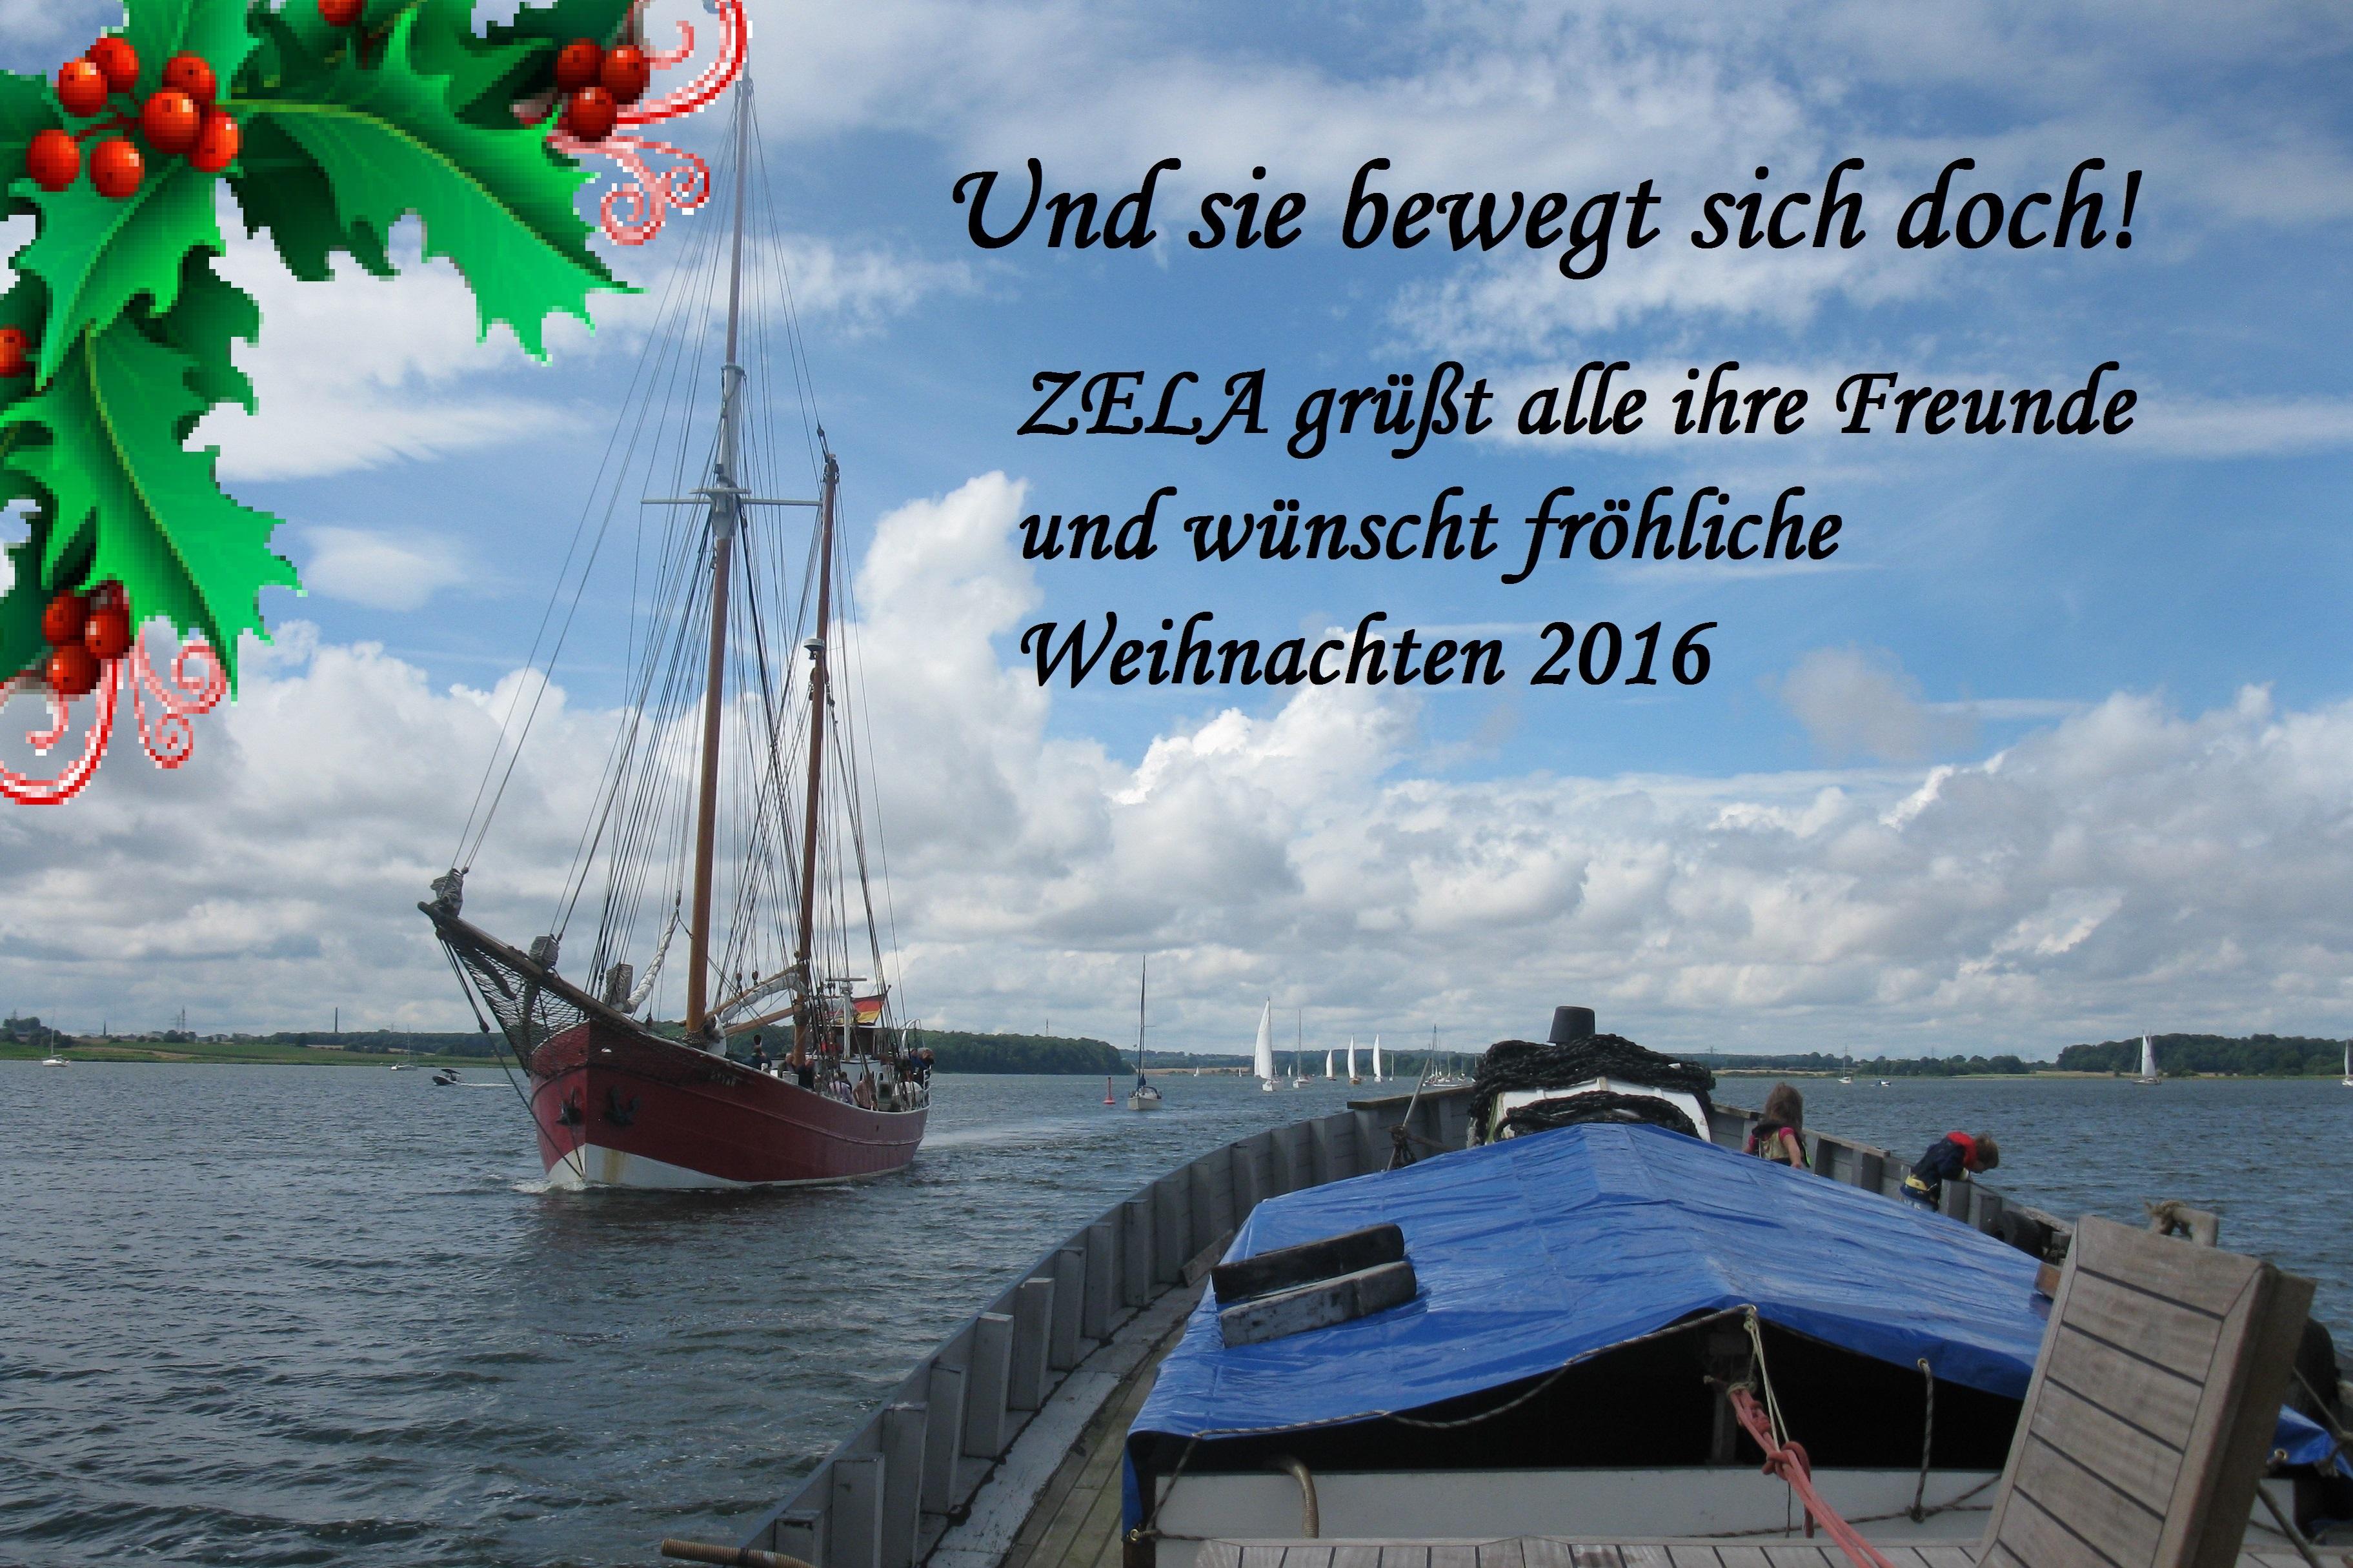 zela-weihnachtskarte-2016